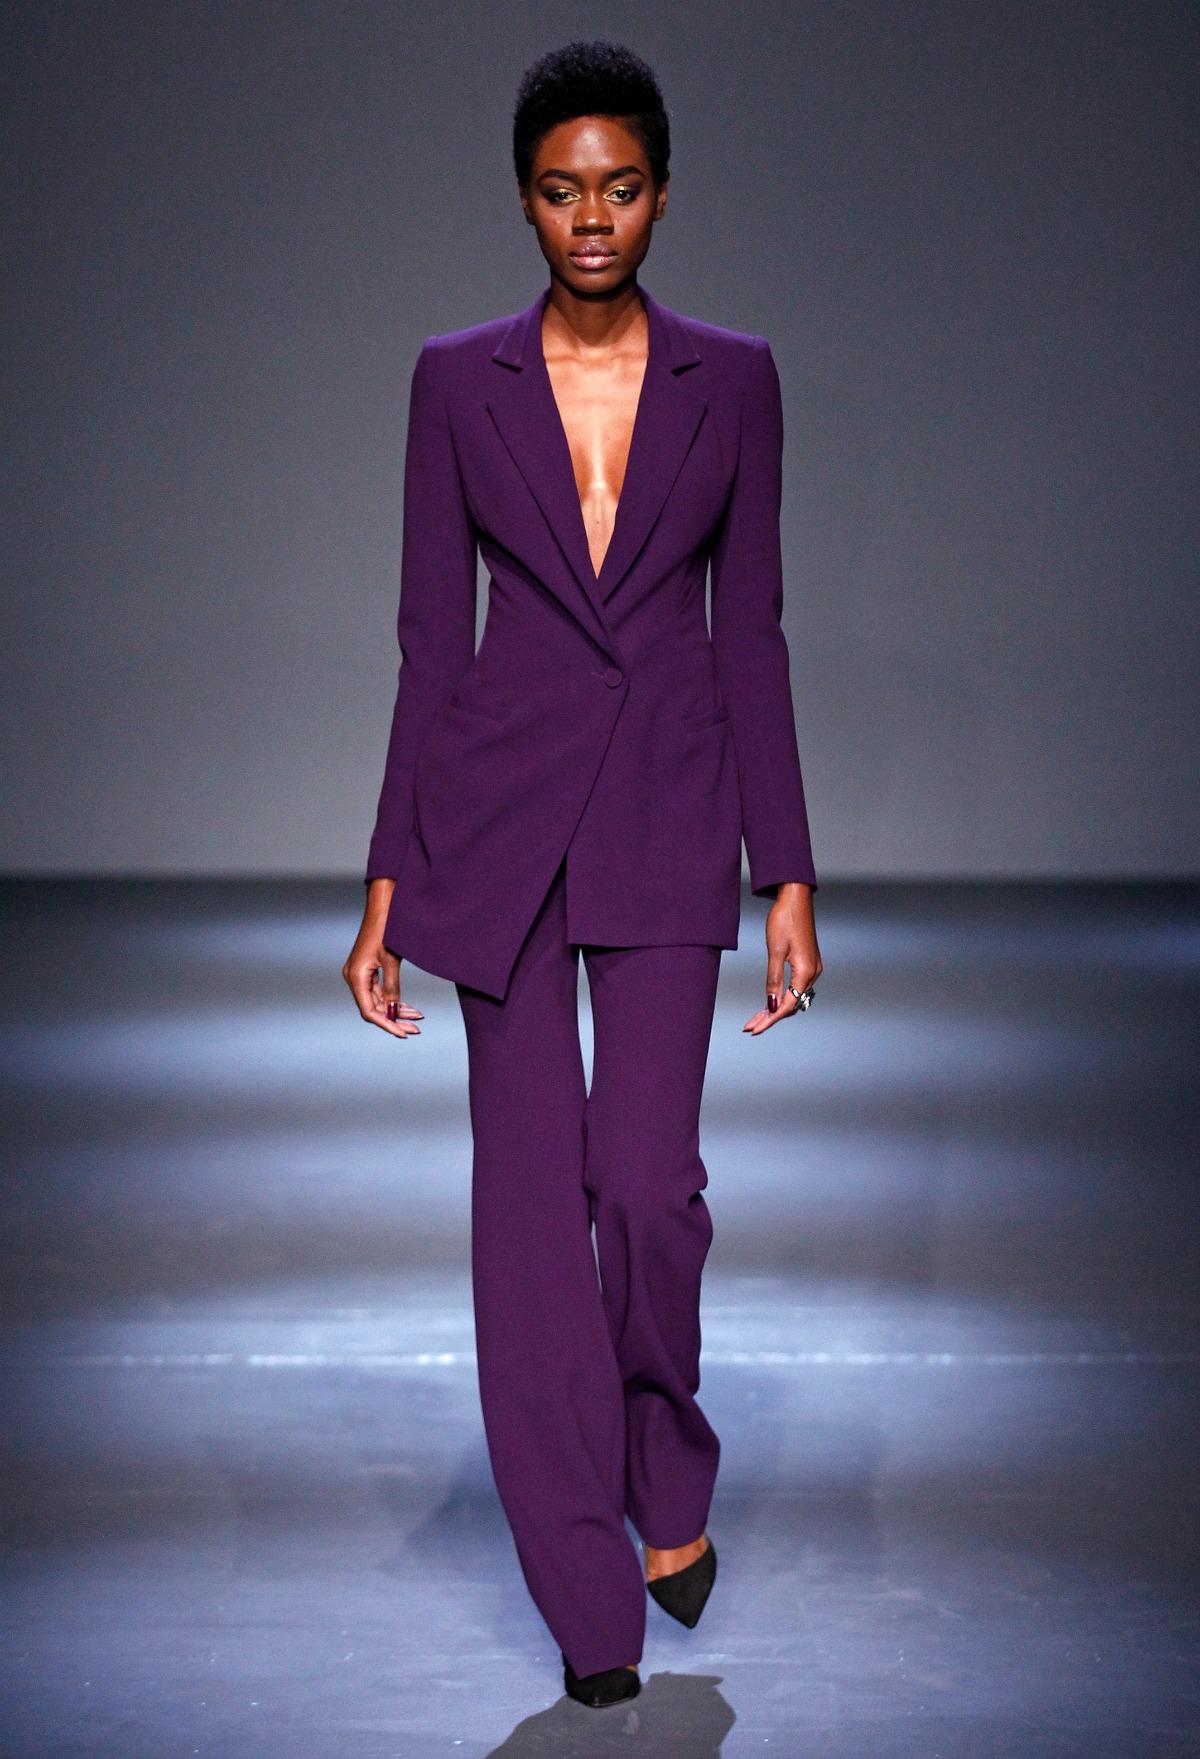 Pamella Roland Fall 2018 Runway I Amethyst Purple Power Suit #NYFW #FallFashion